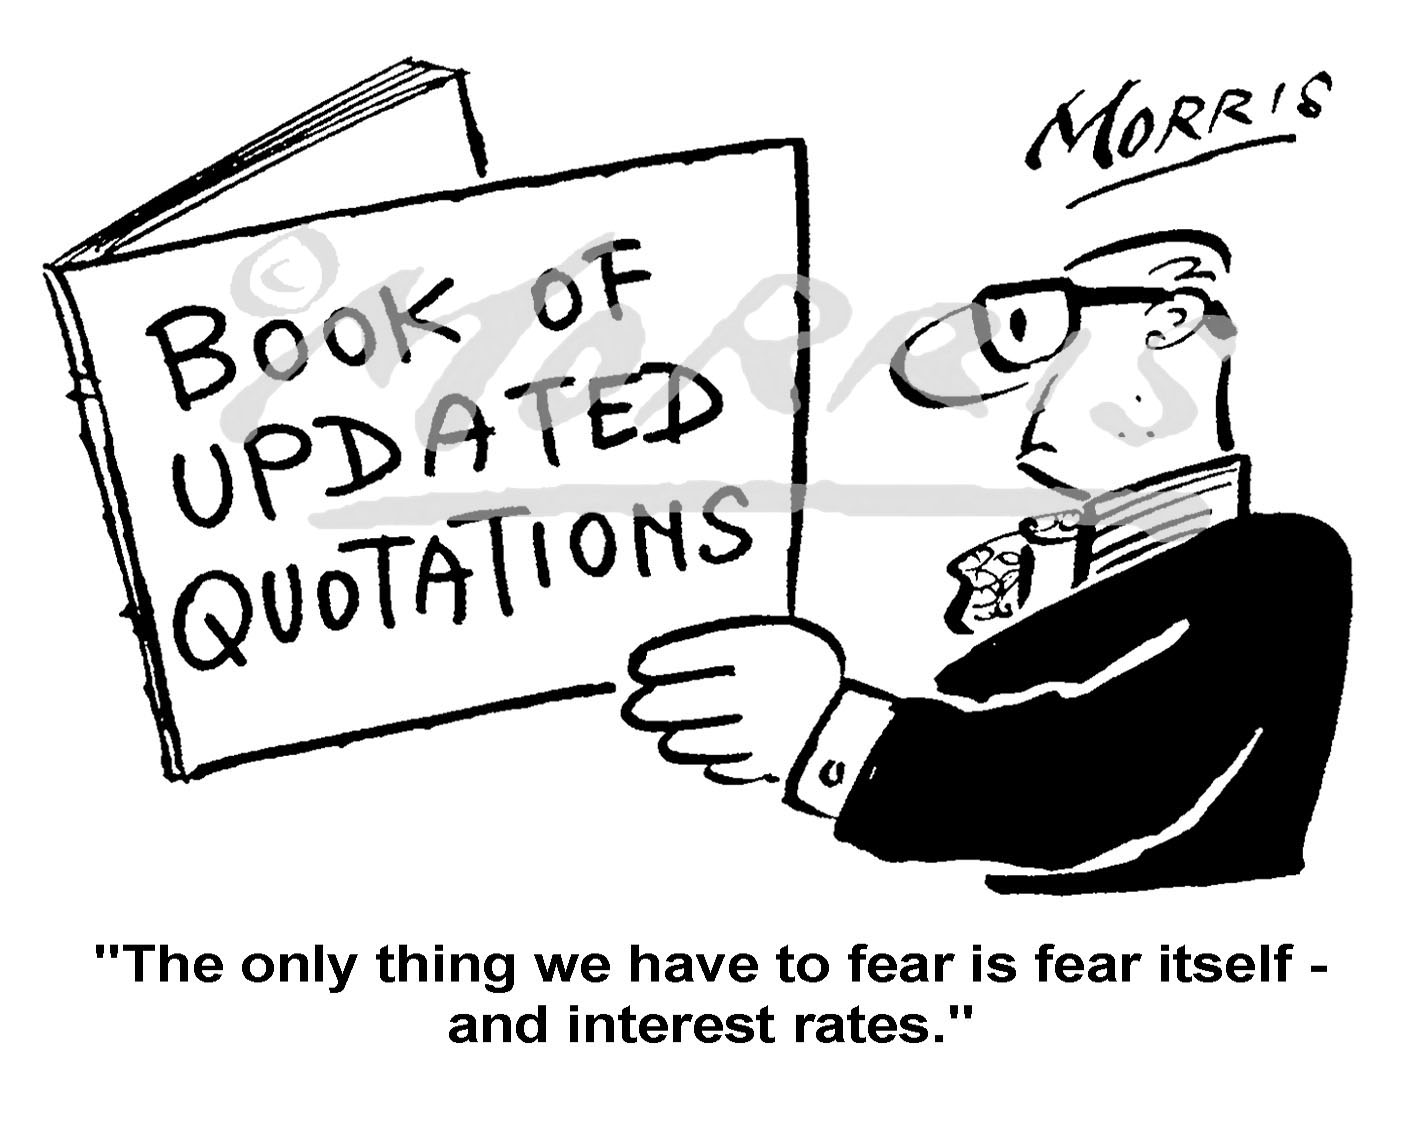 Interest rates cartoon – Ref: 5038bw